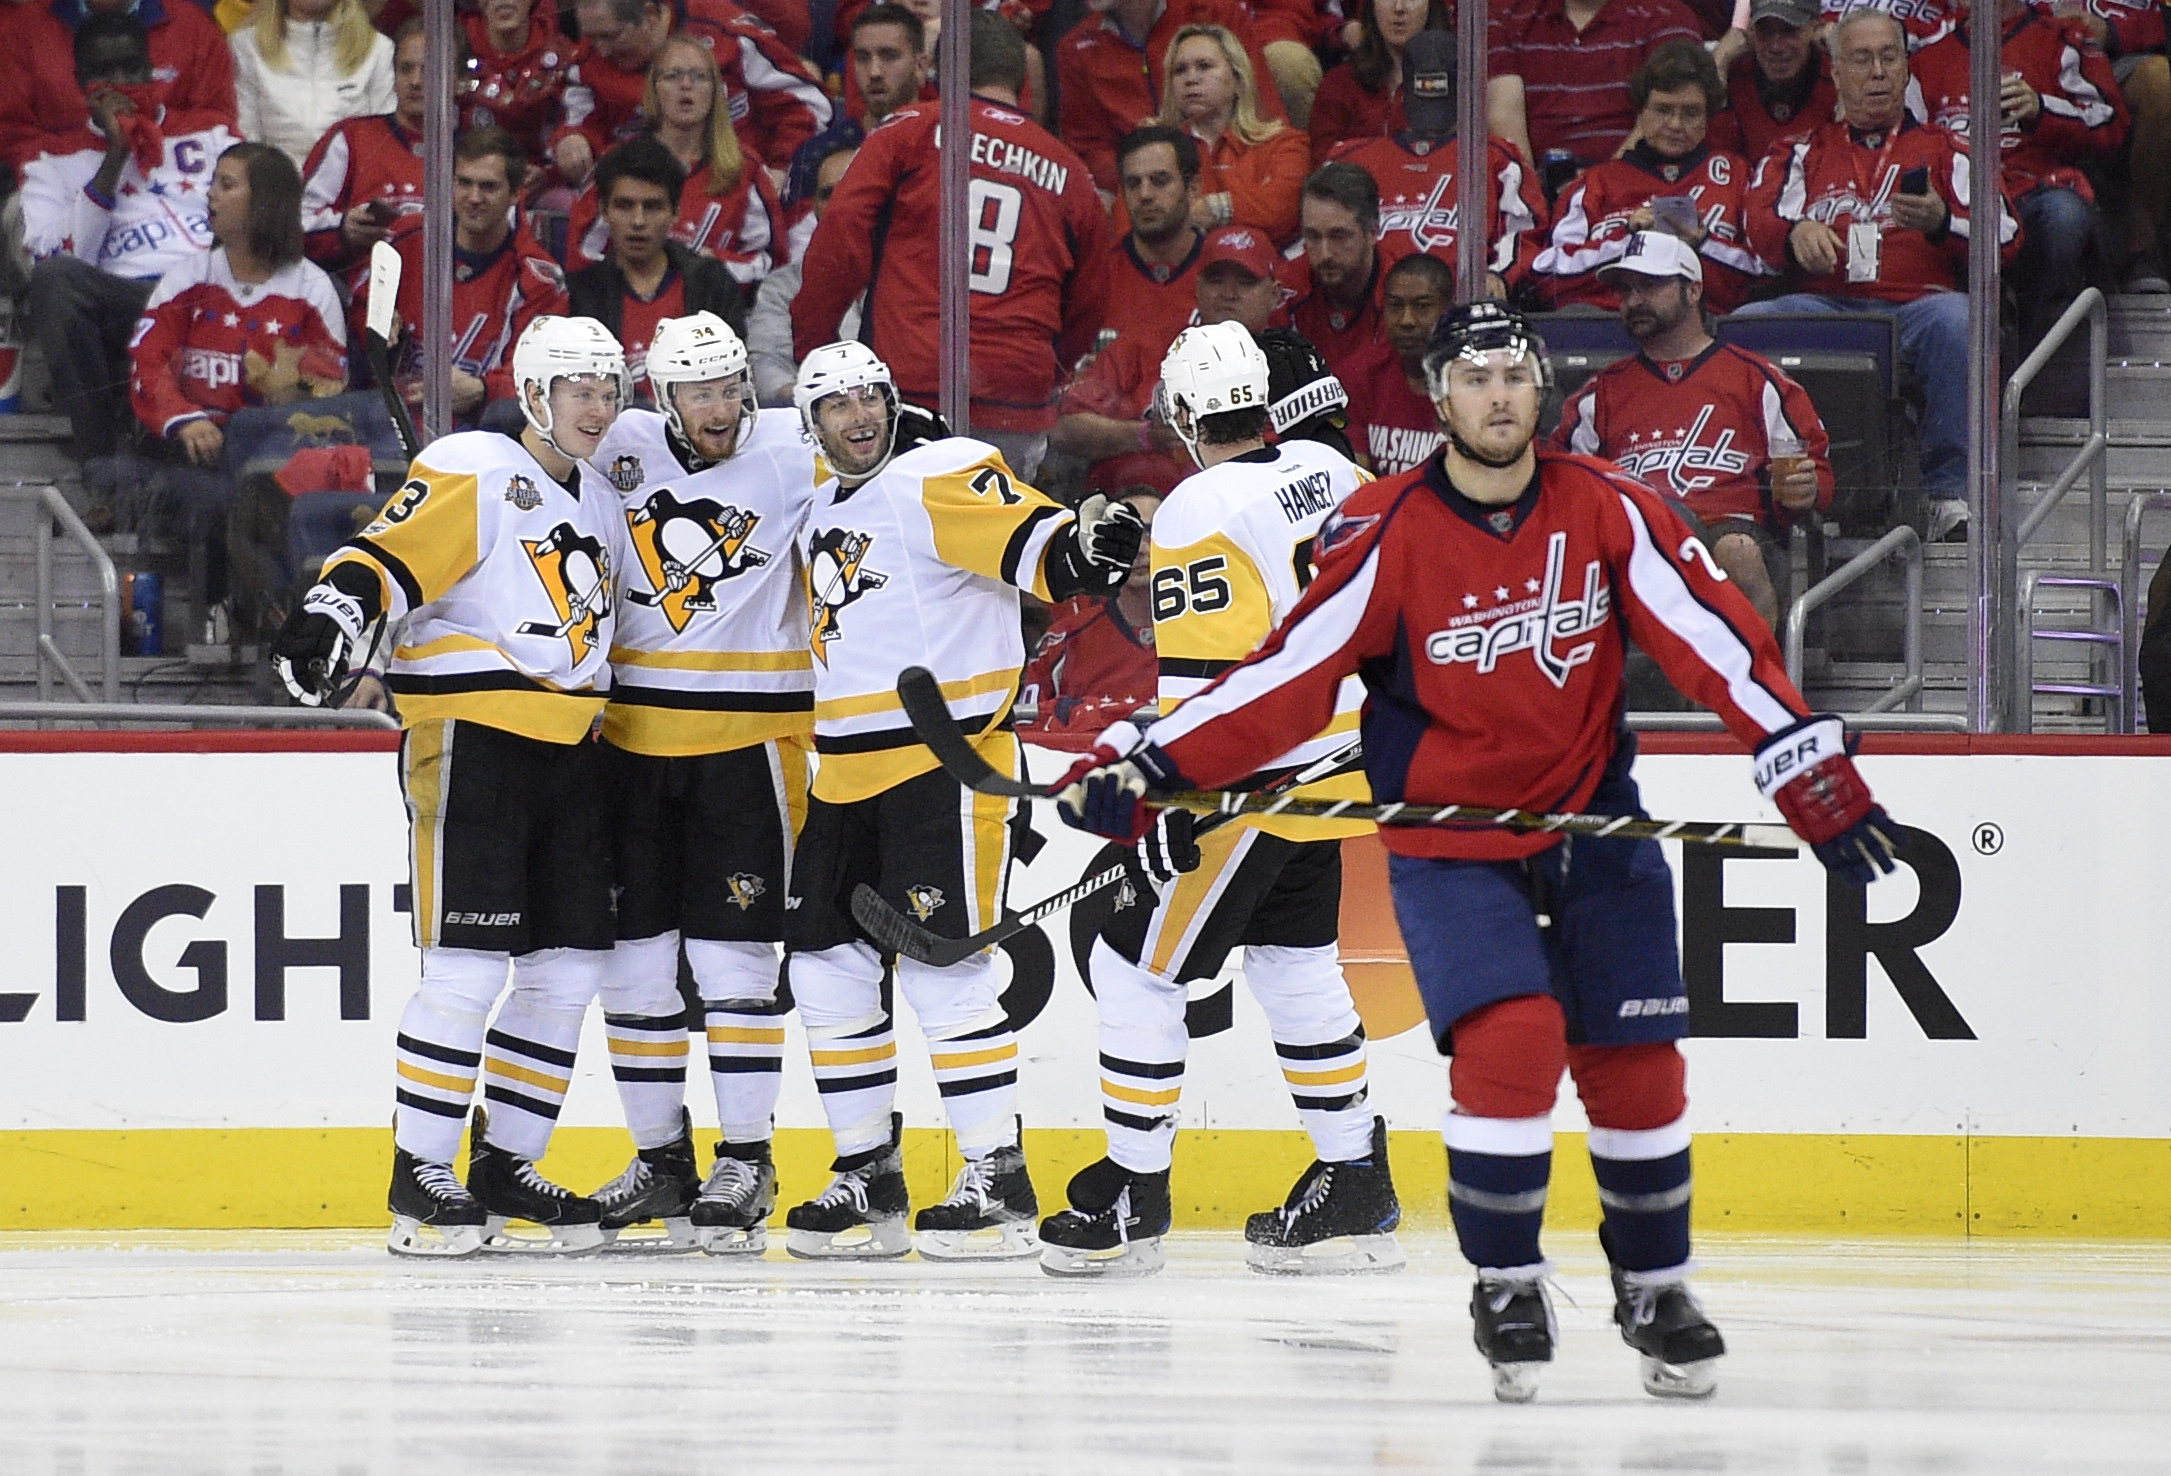 Penguins_capitals_hockey_08619.jpg-0927f